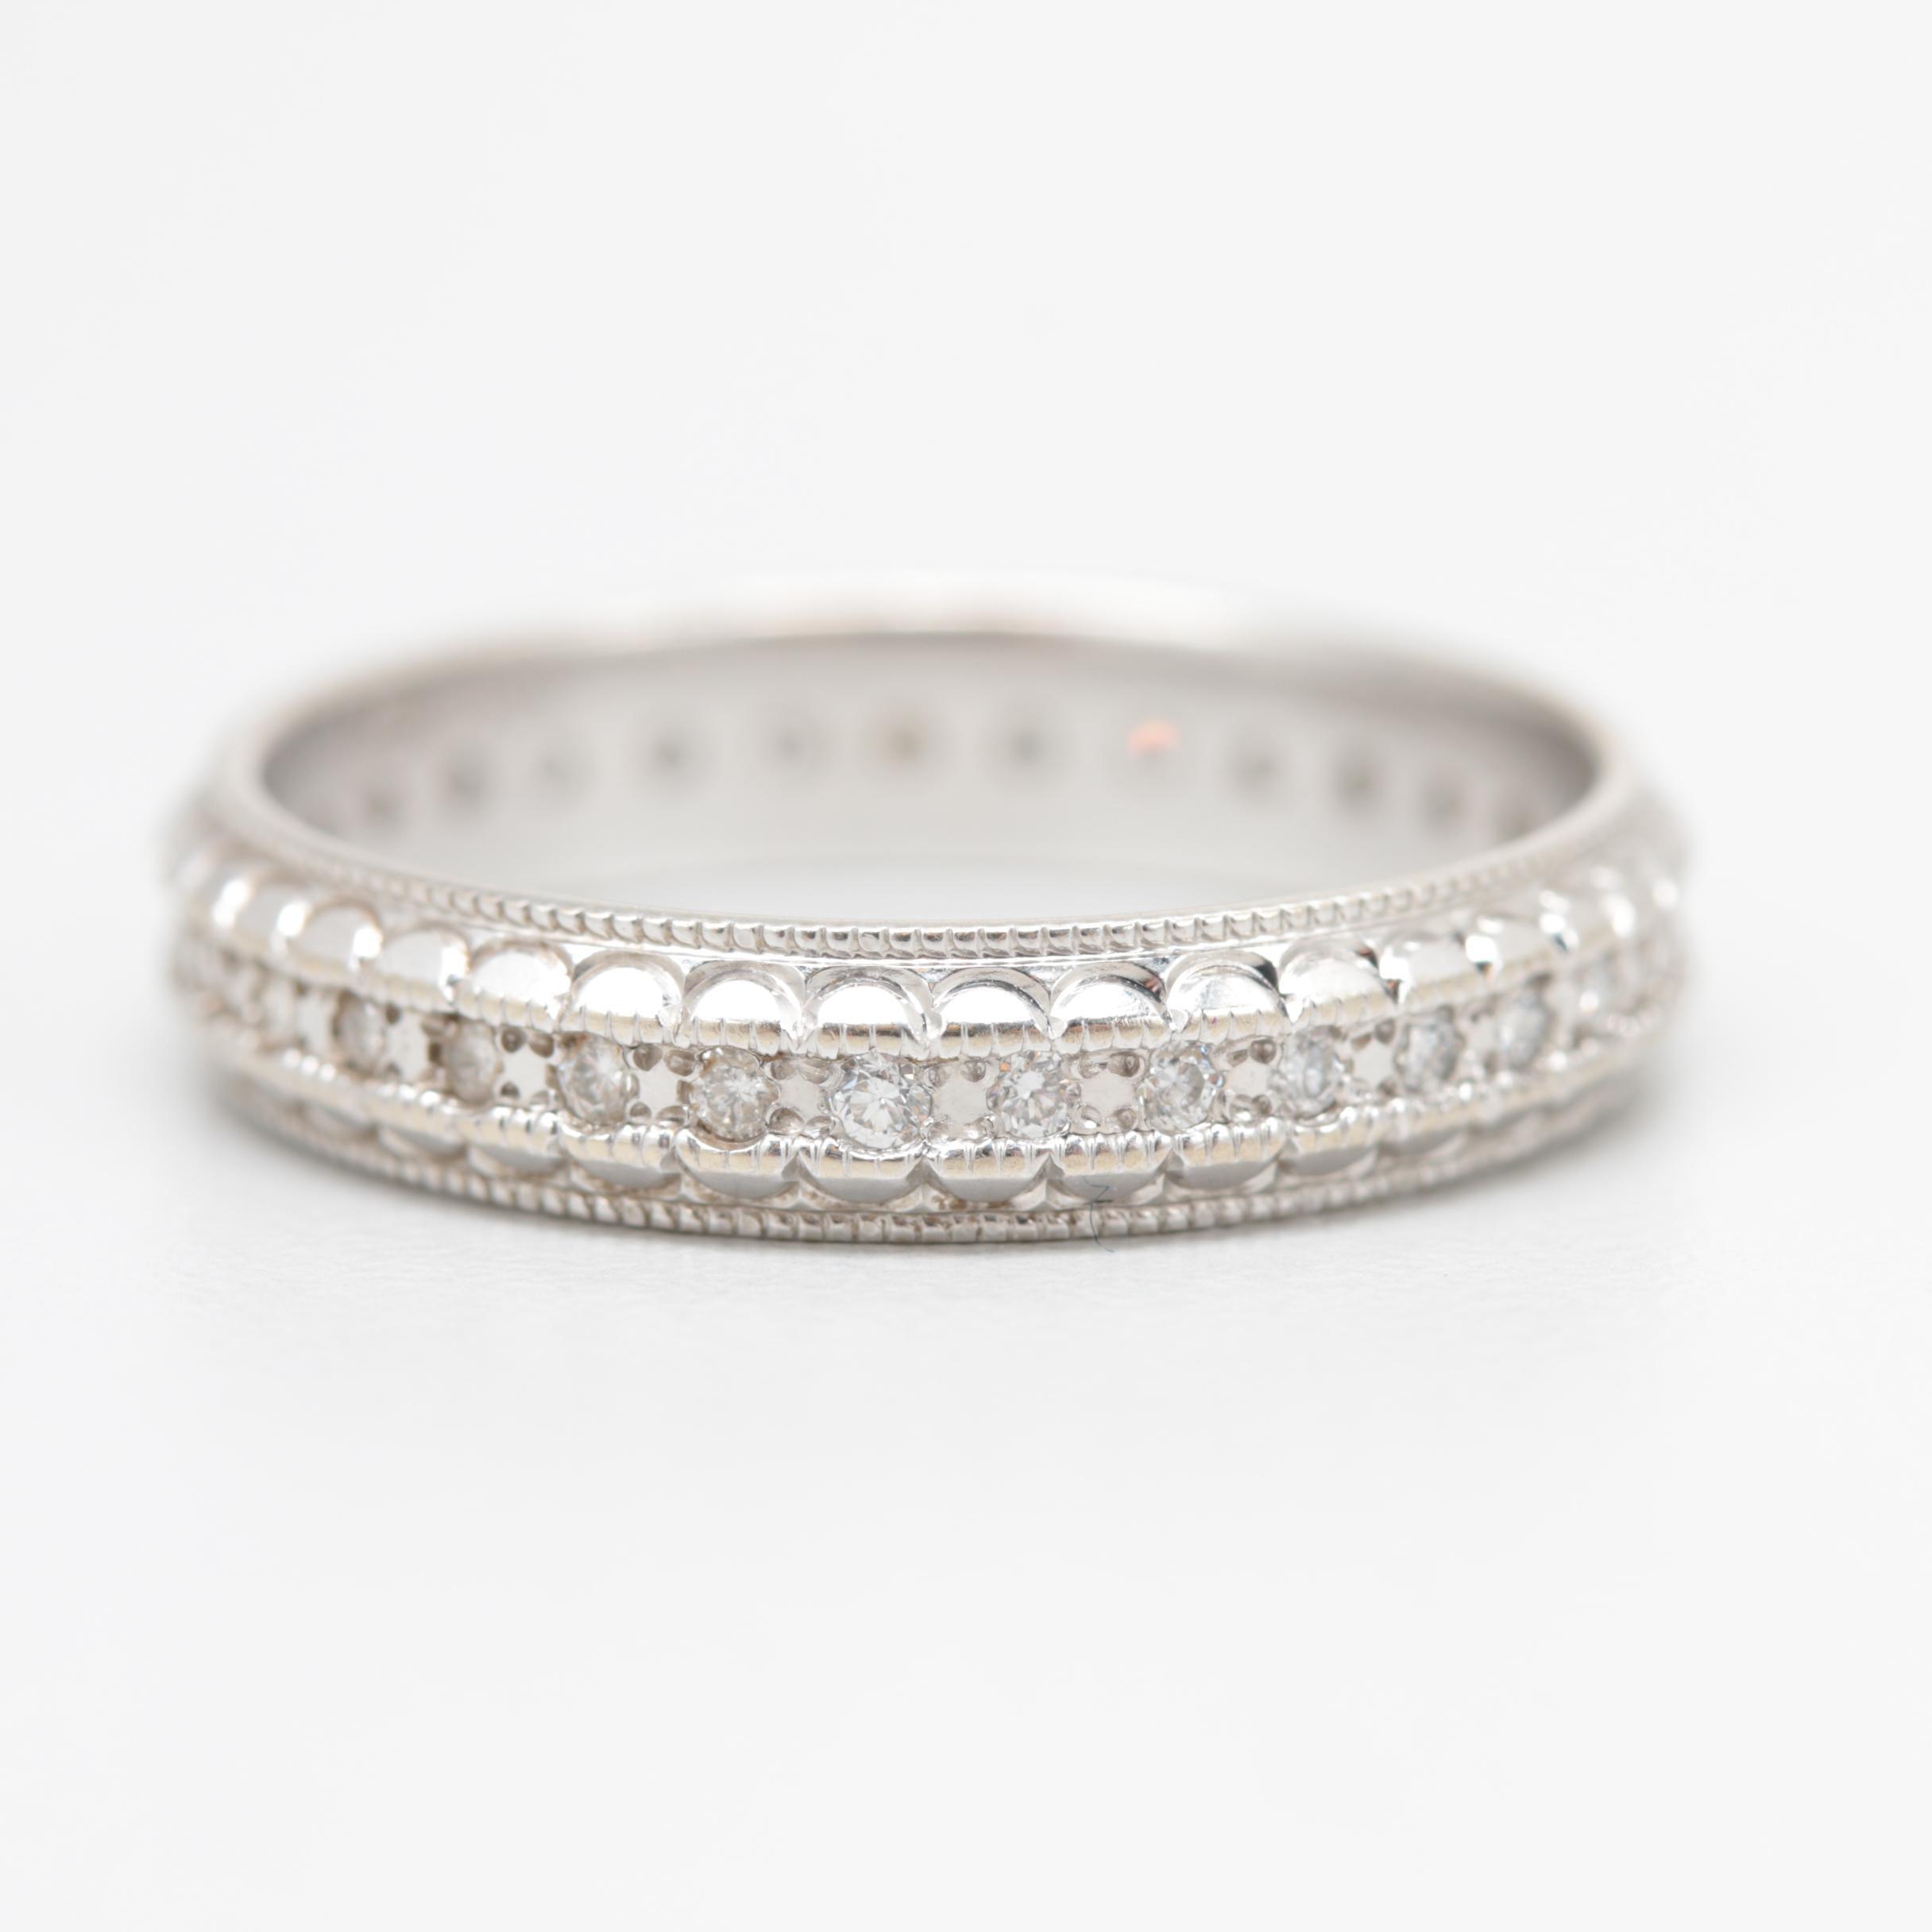 14K White Gold Diamond Eternity Band Ring